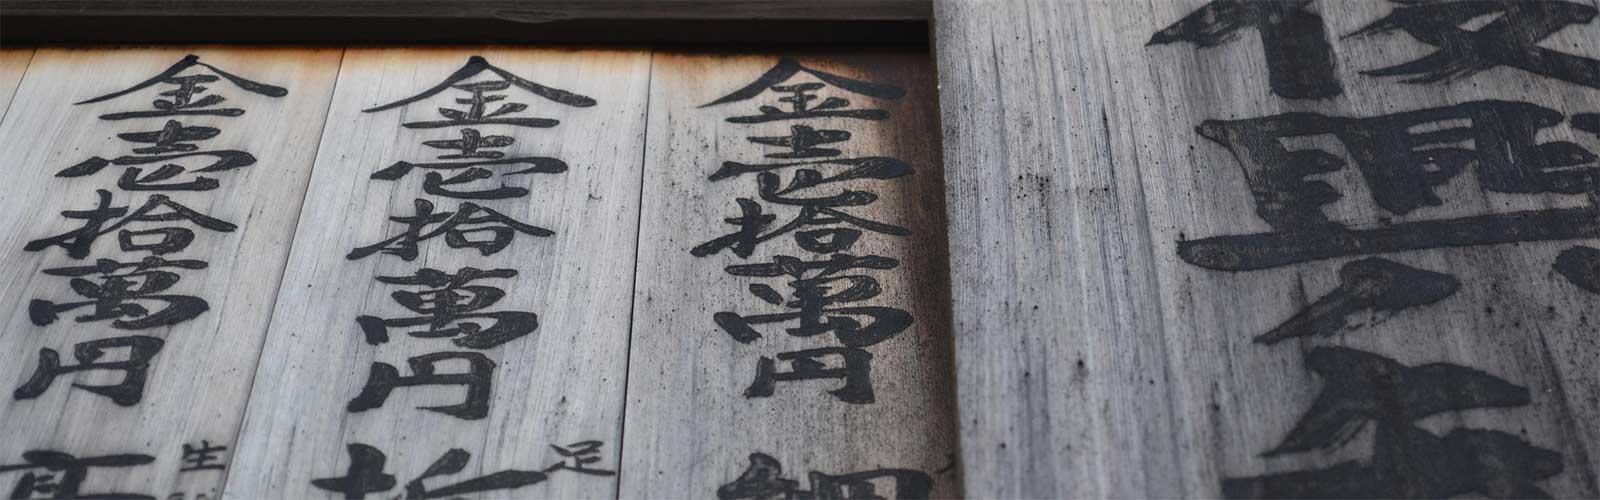 Five Tips to Increase Baidu SEO Ranking